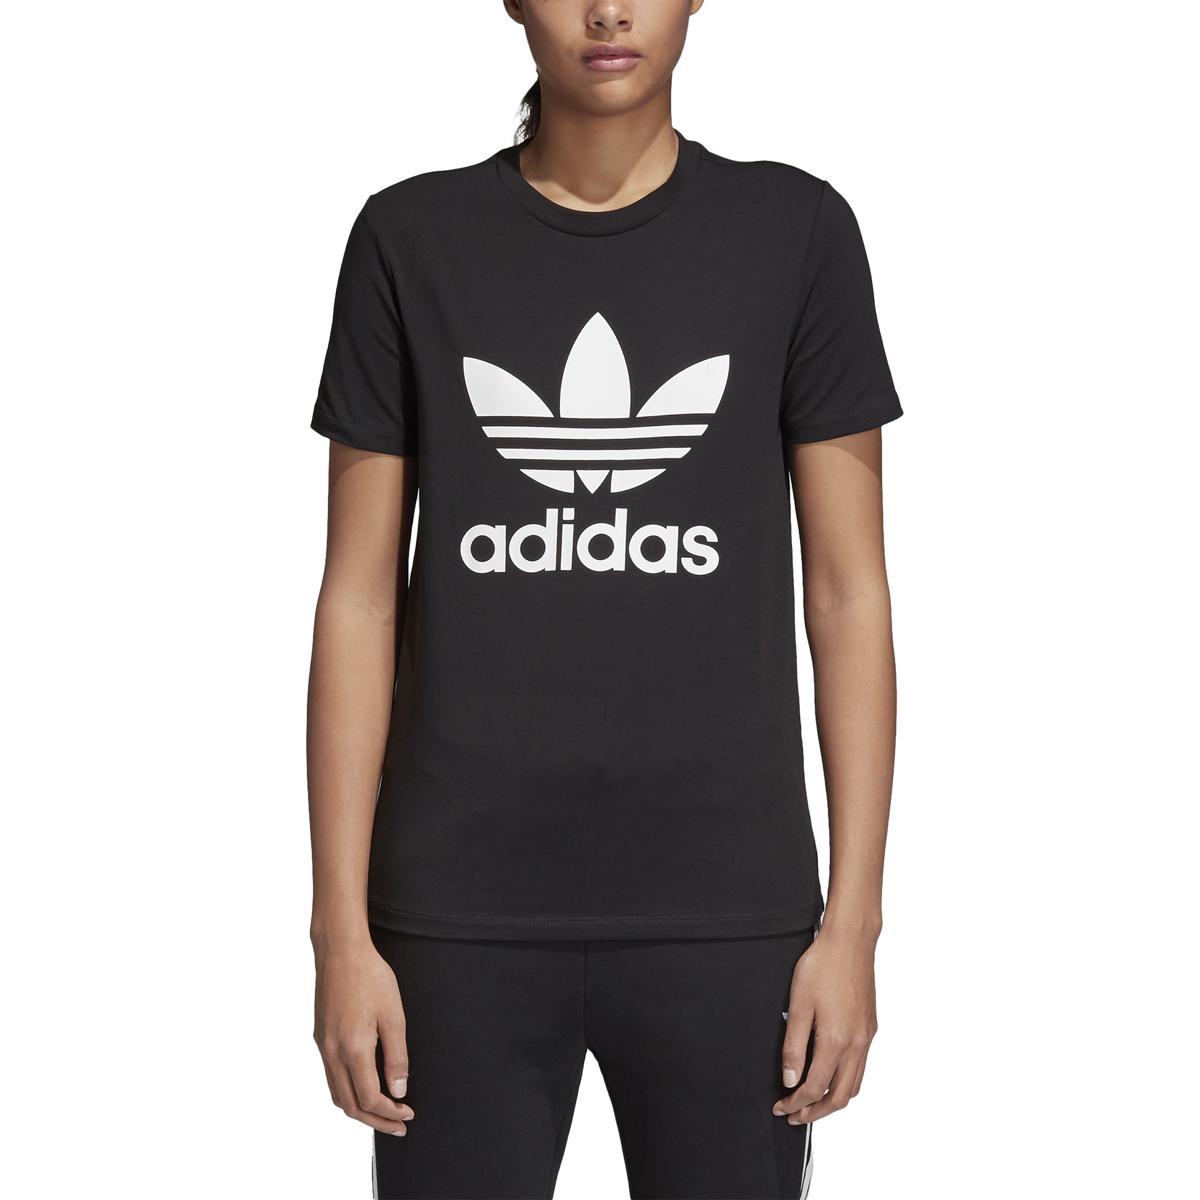 f78aee86470 Details about Adidas Originals Trefoil Tee Women s Shirt Black White cv9888